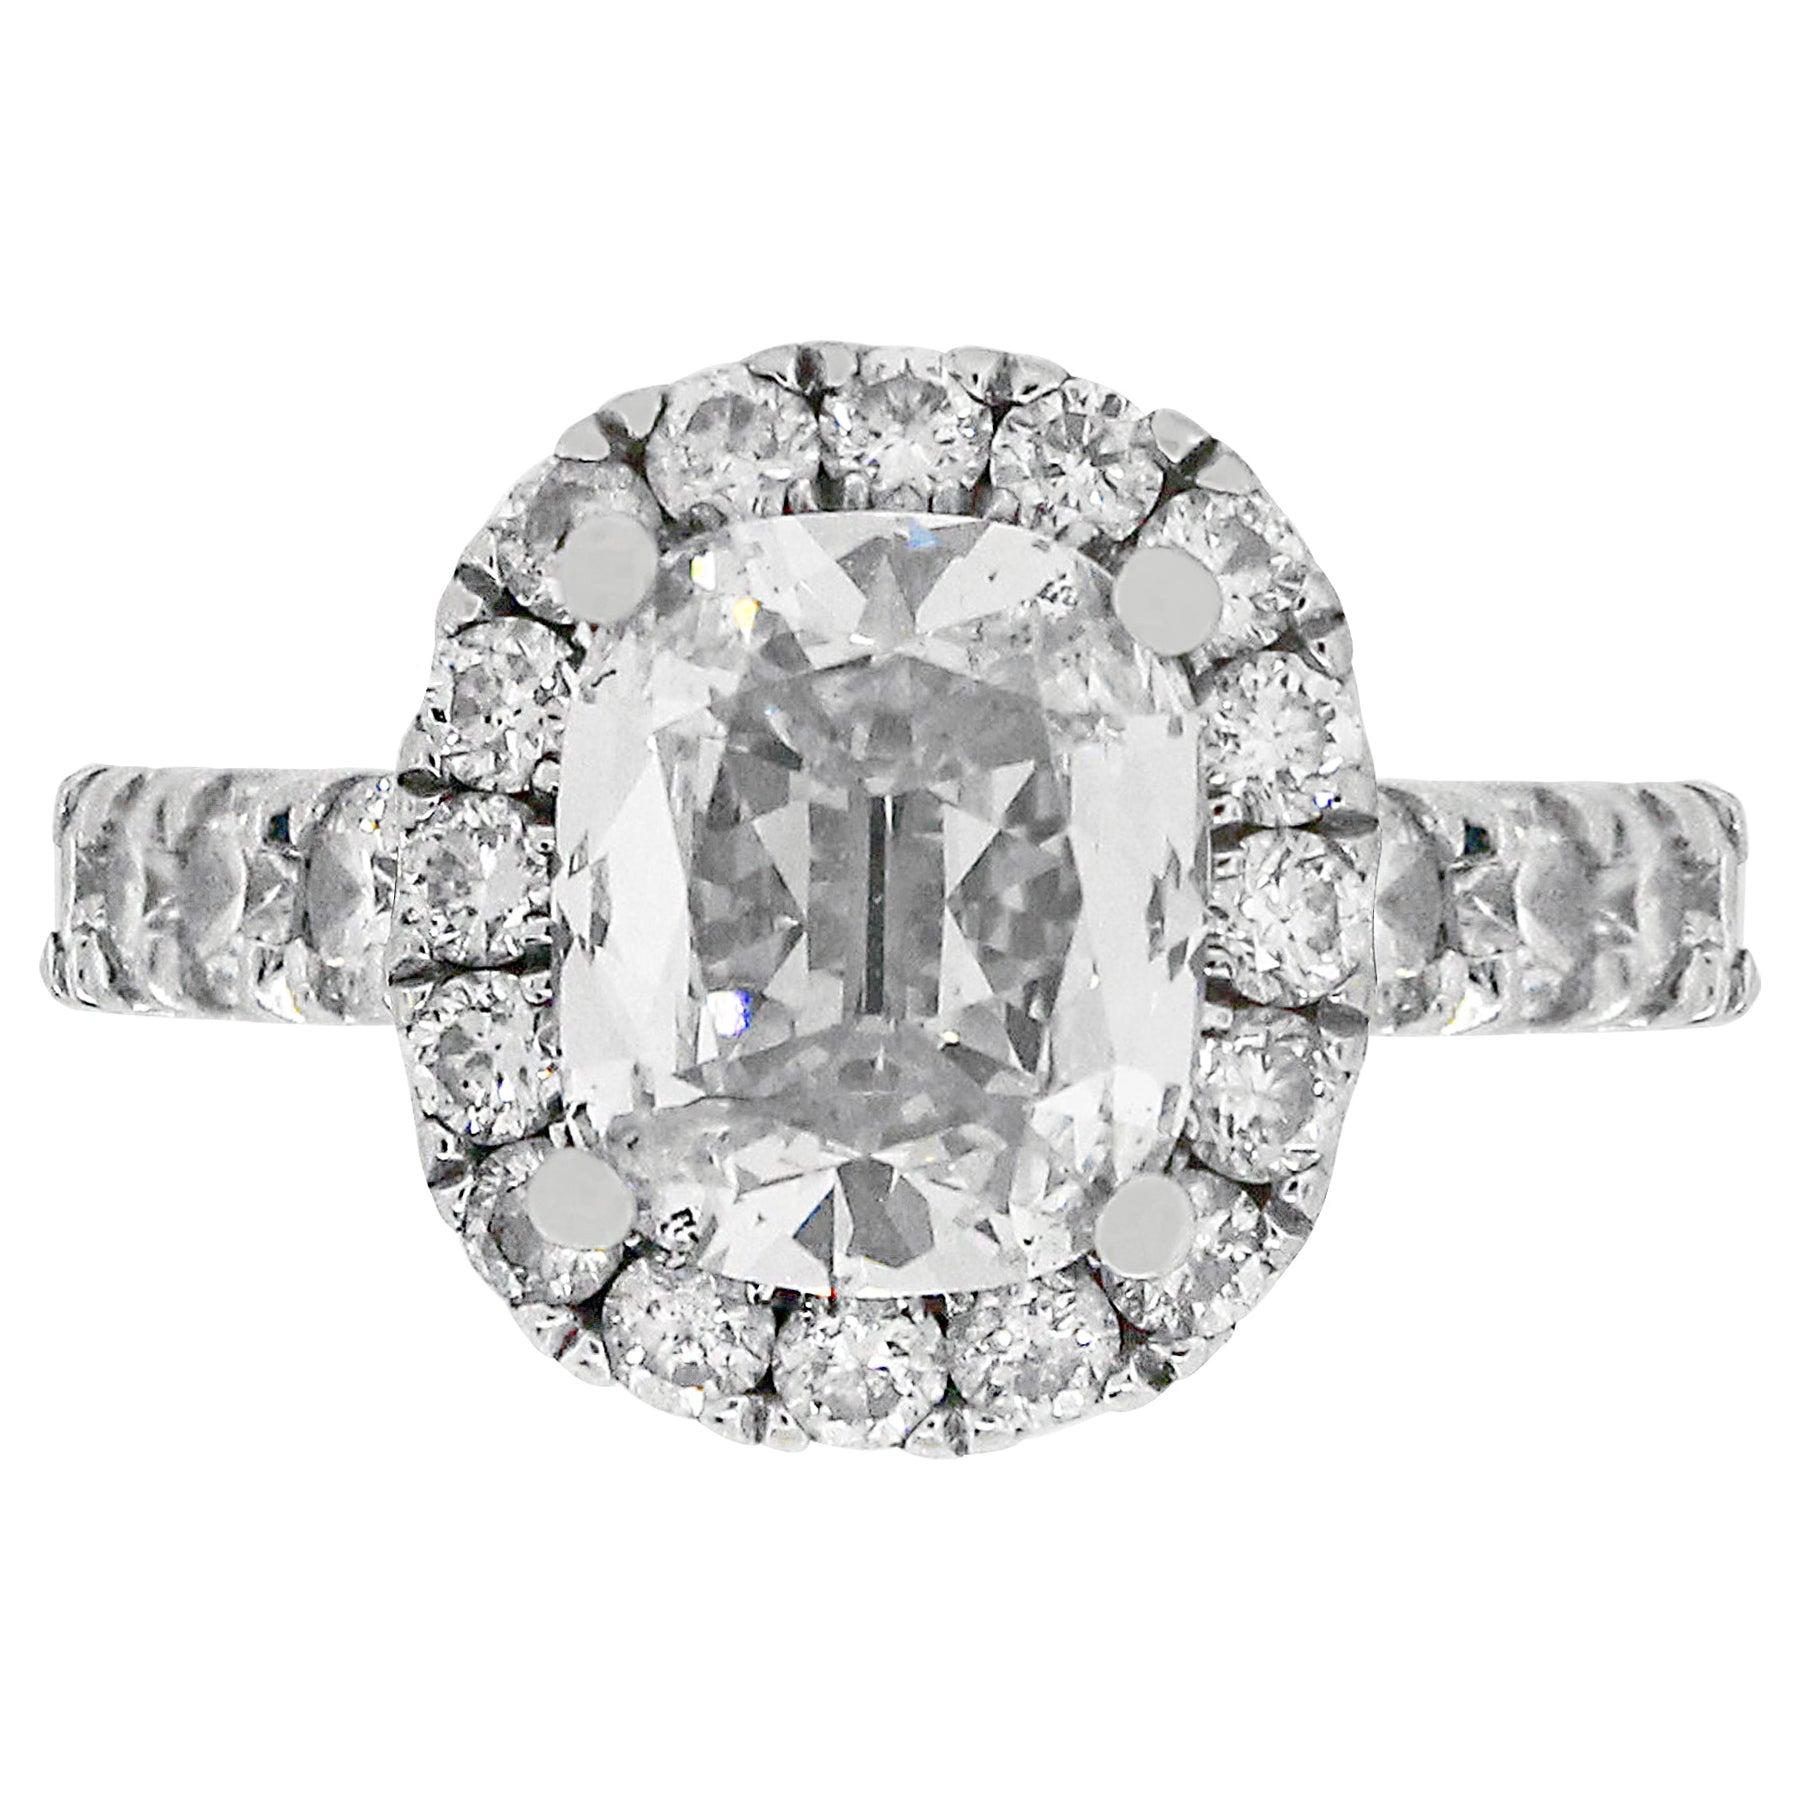 1.37 Carat Cushion Cut Engagement Ring